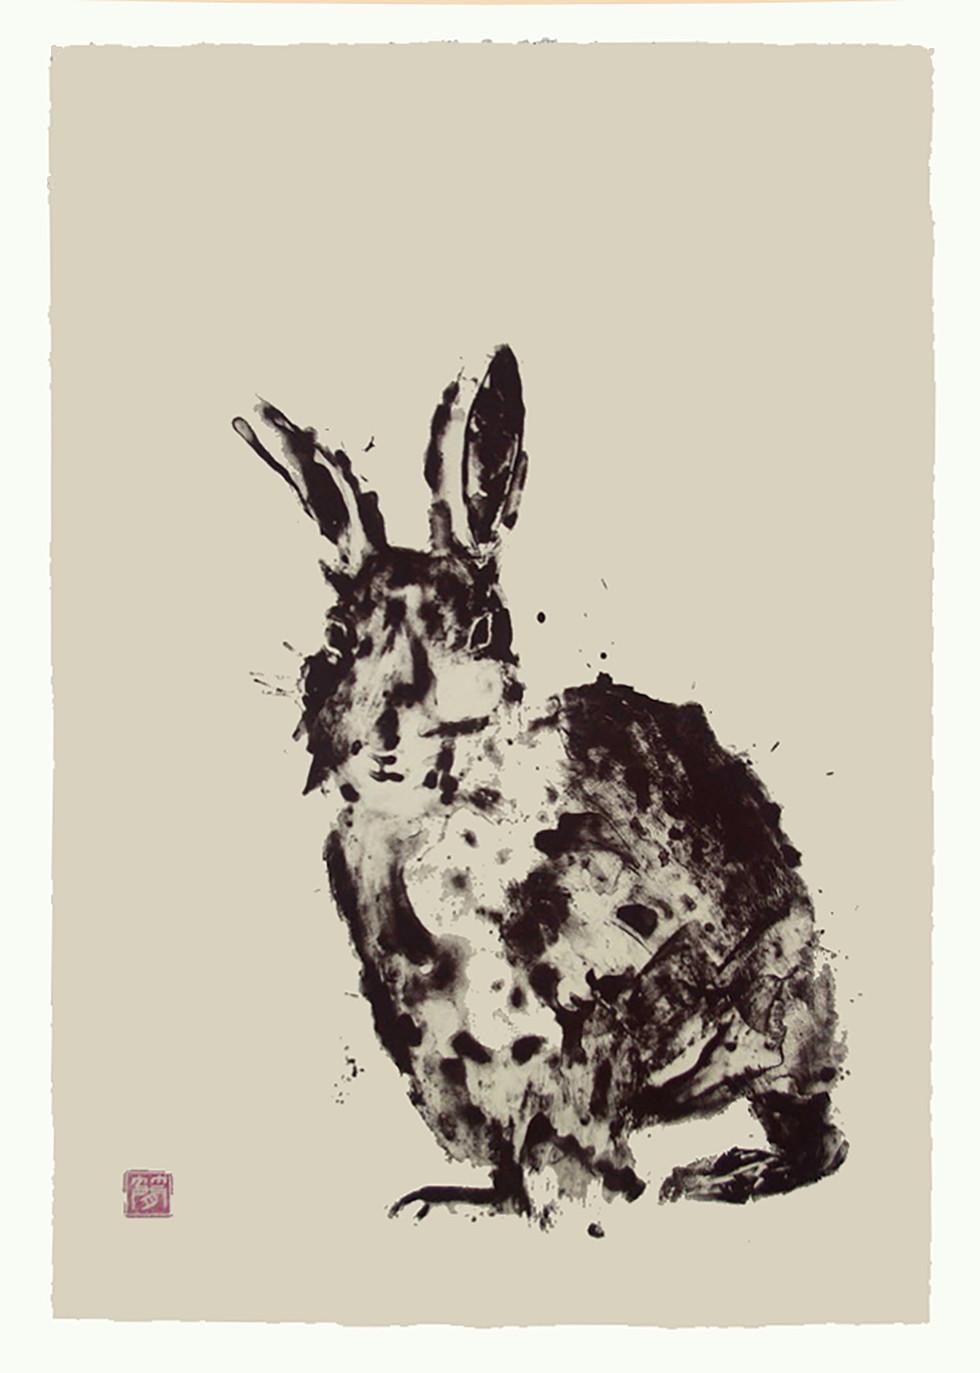 Jane Sampson 'Lucky Rabbit' Silkscreen Personal Project 38 x 56cm Edn 20